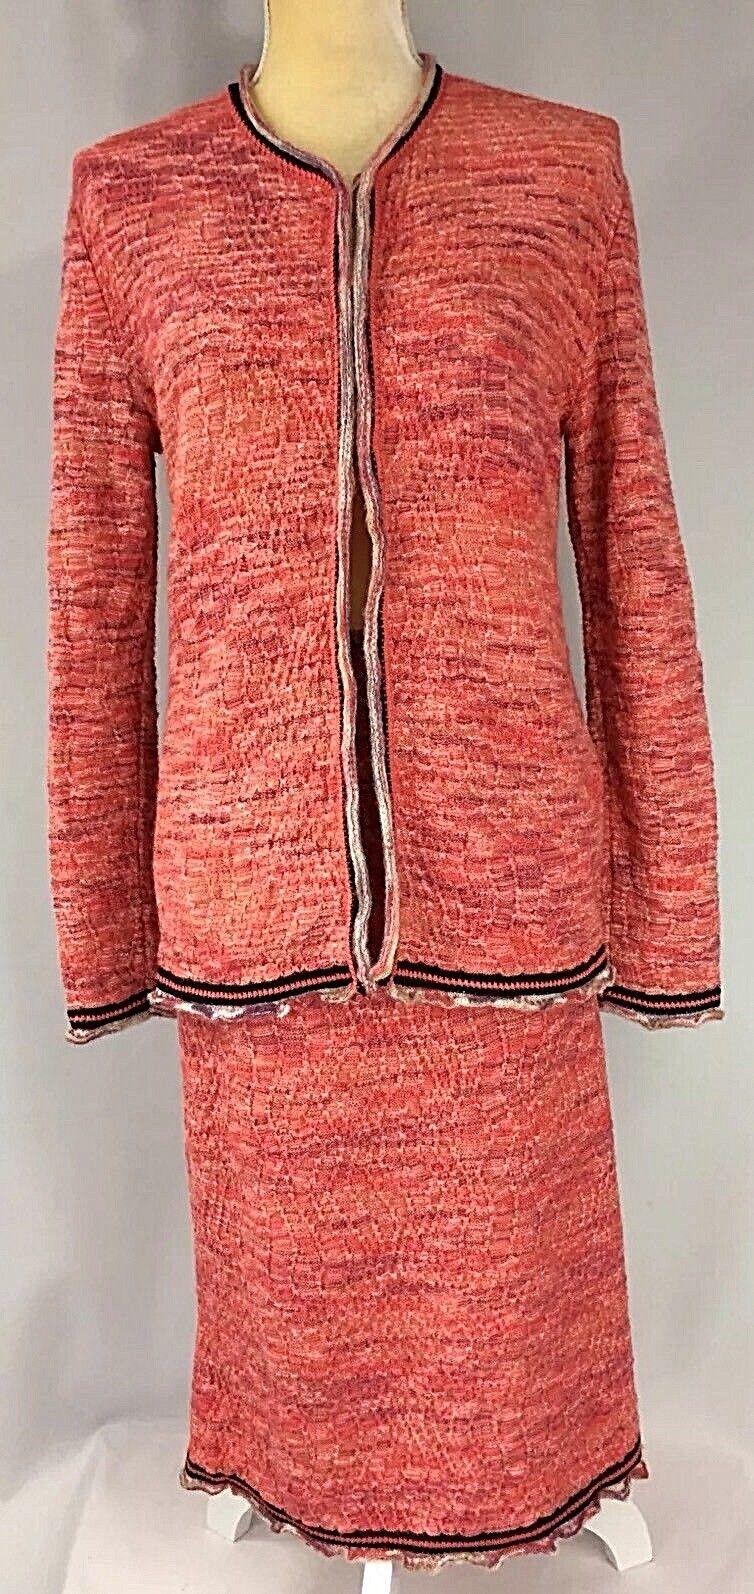 Missoni Women 2-Pc Suit Skirt Sweater Set Cardigan 46 Large Wool Knit Pink Beige